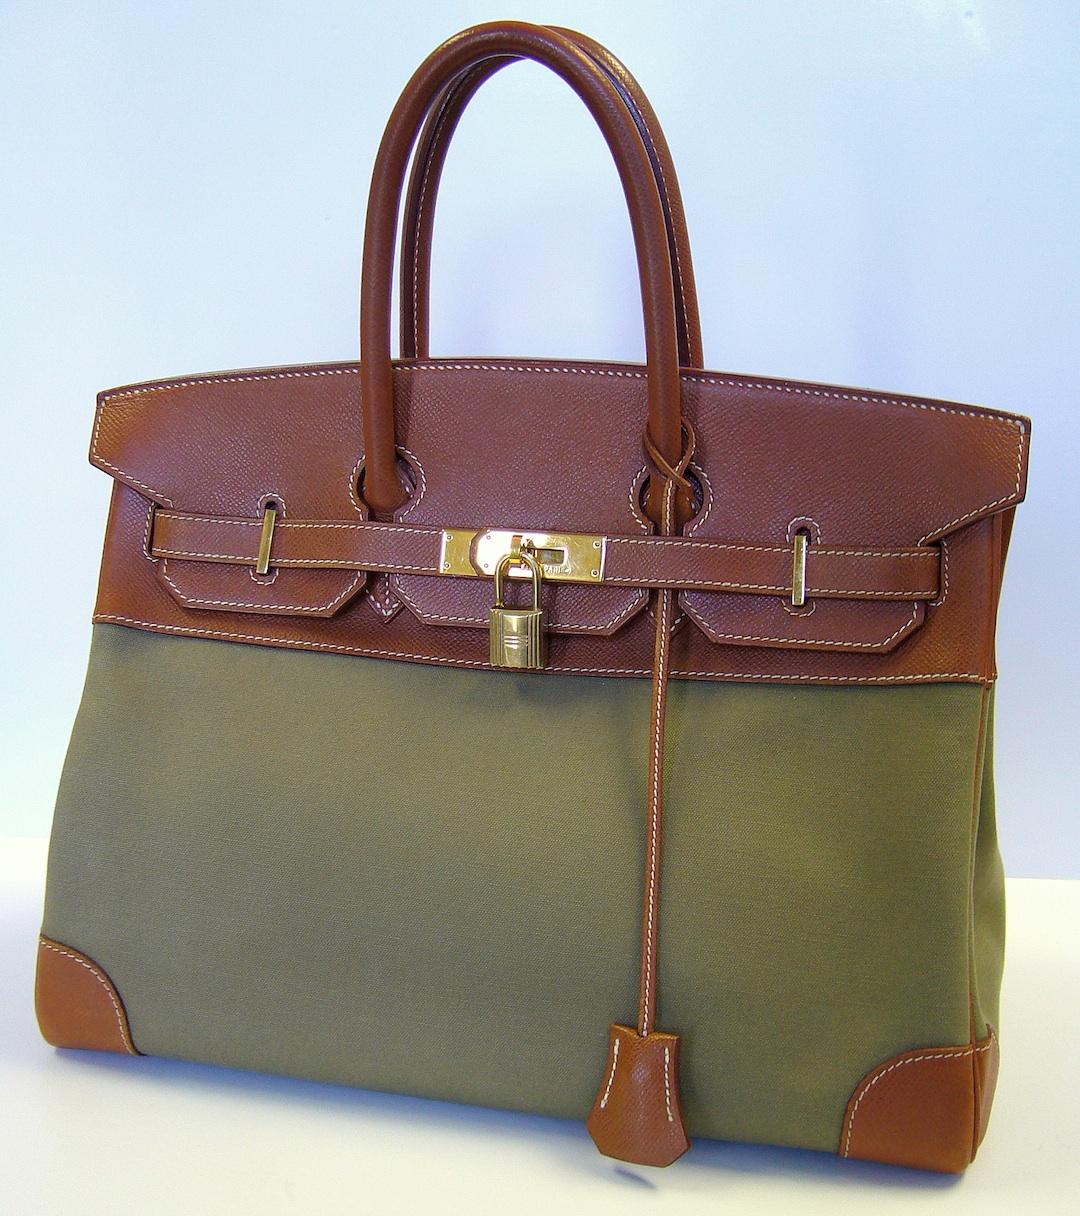 Hermes, Chanel, Dior And More: Visit Handbag